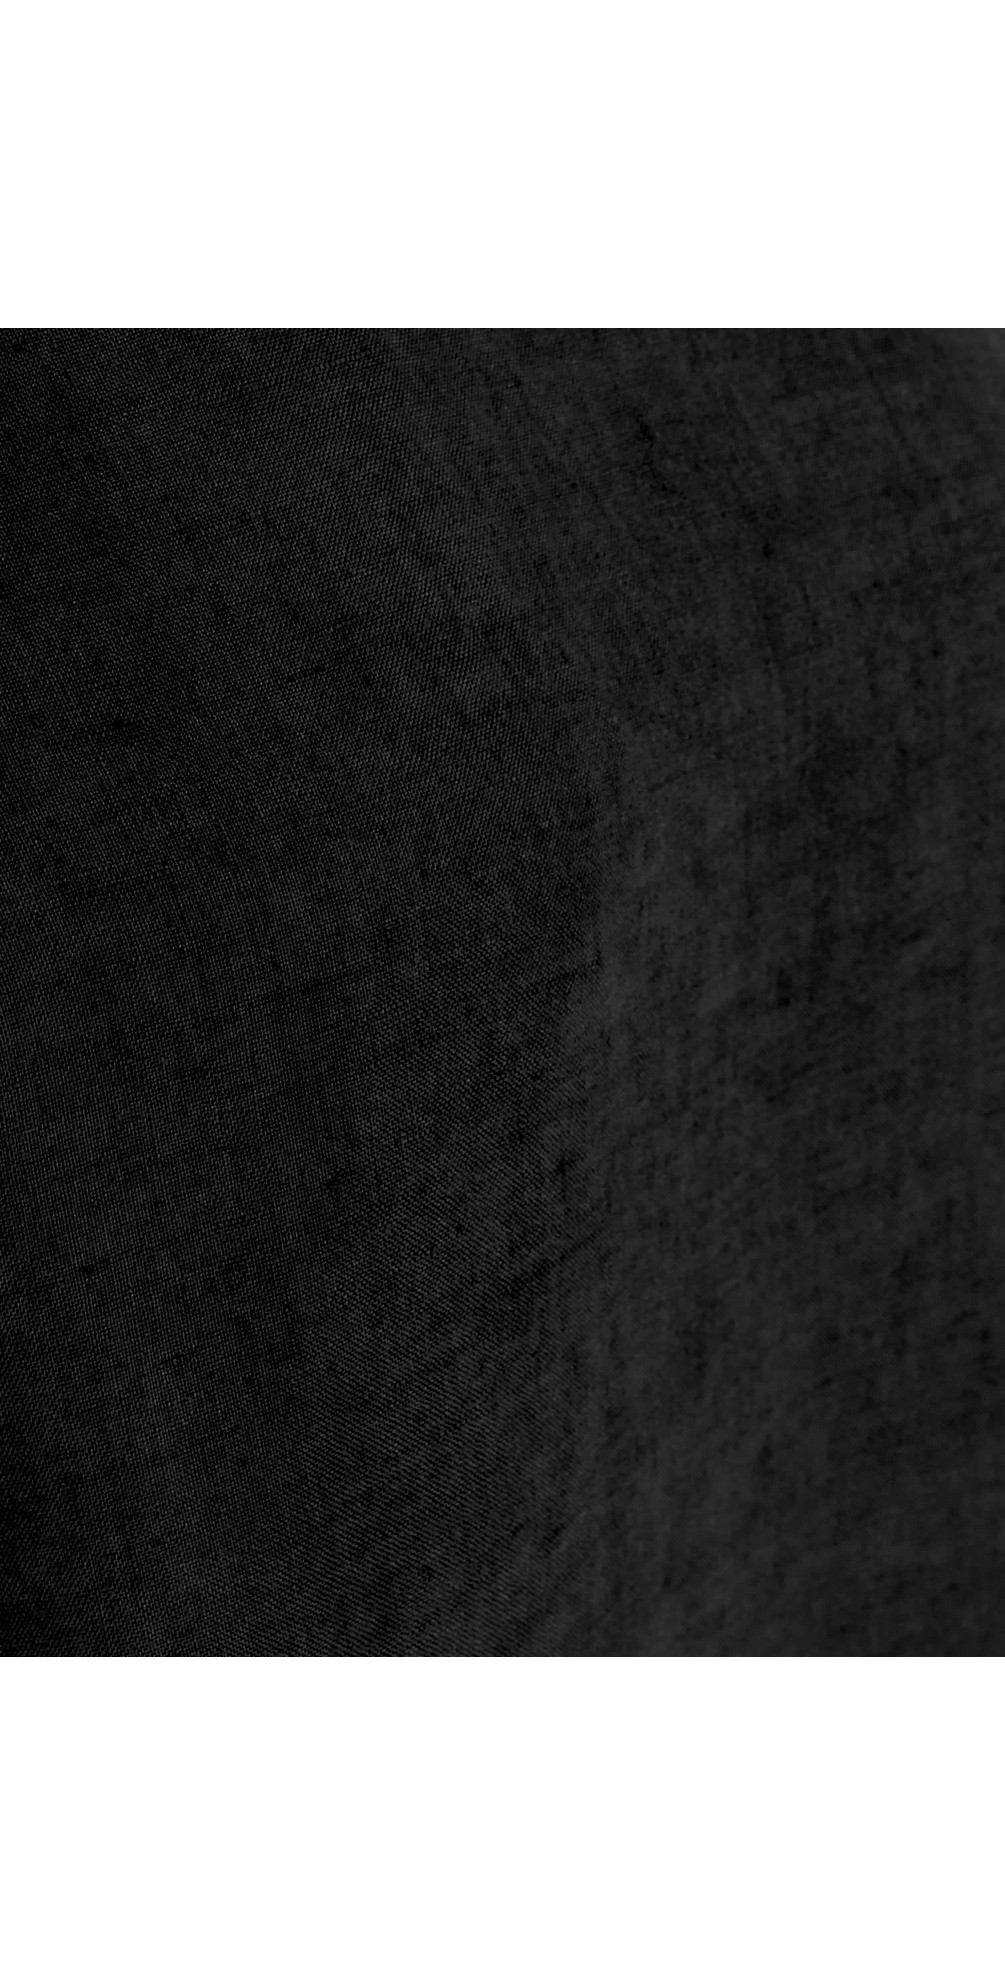 Artisan Arachon Linen Cap Sleeve Top  main image